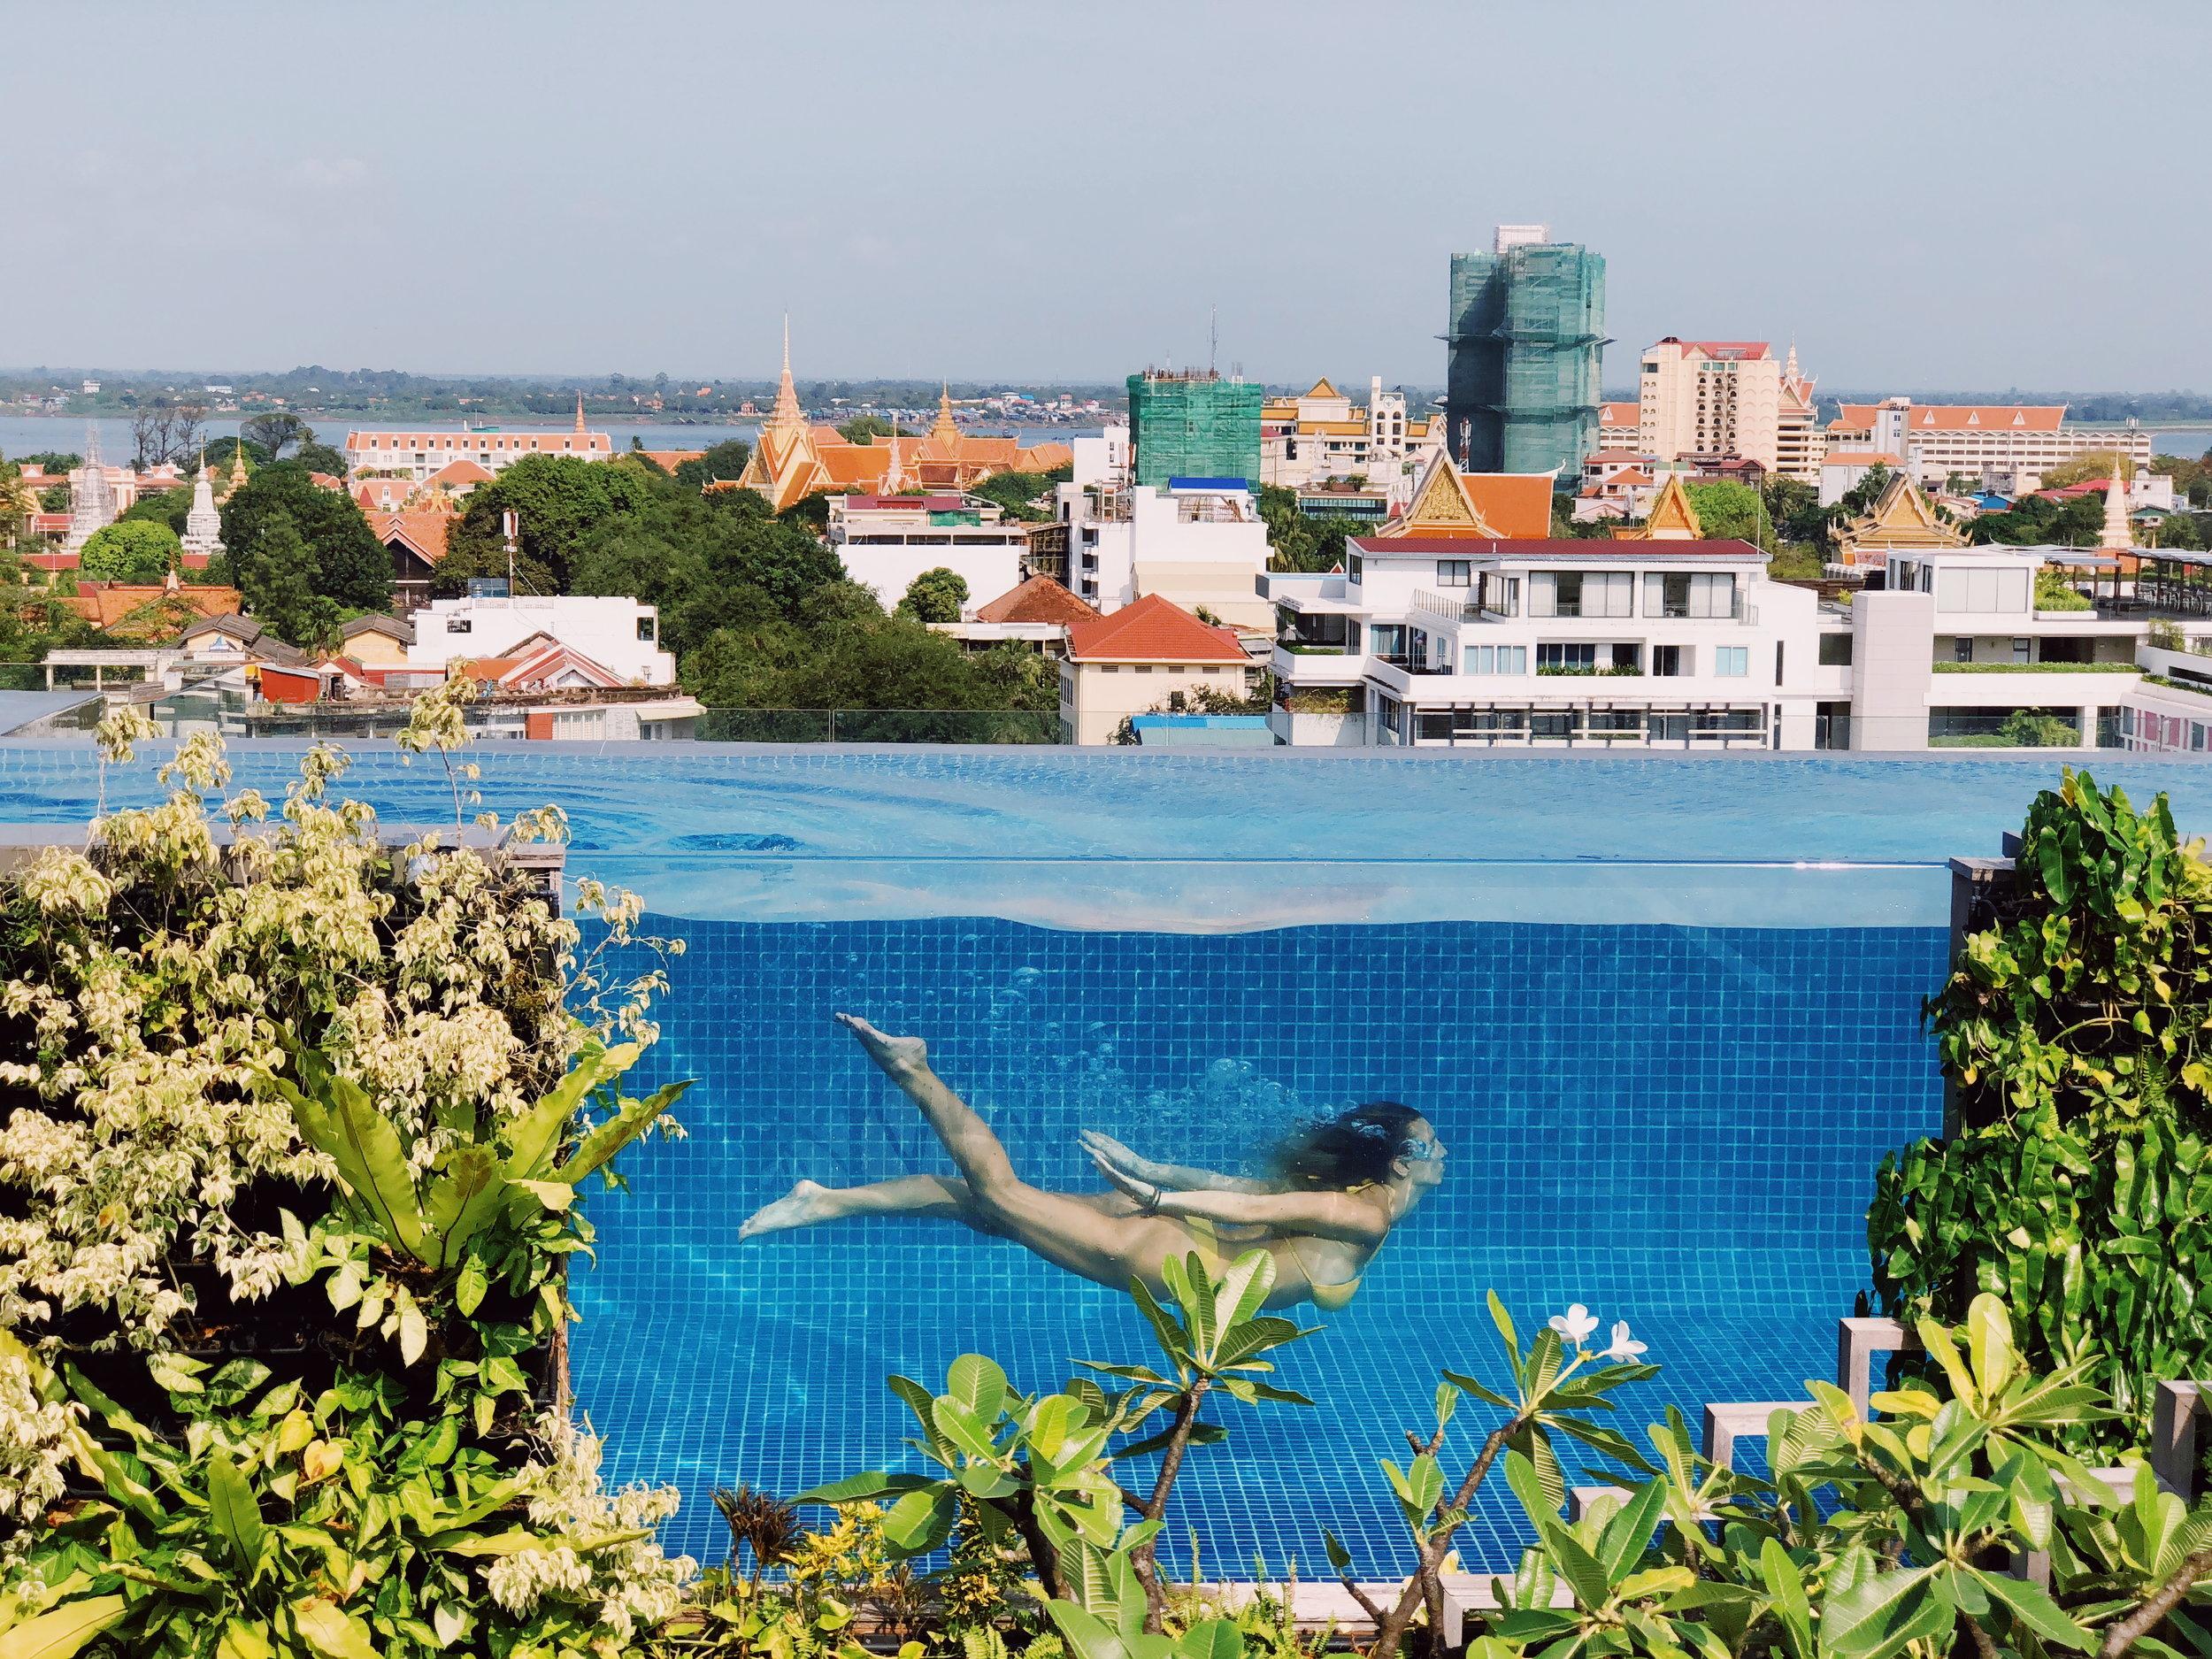 Aquarius Hotel Infinity Pool